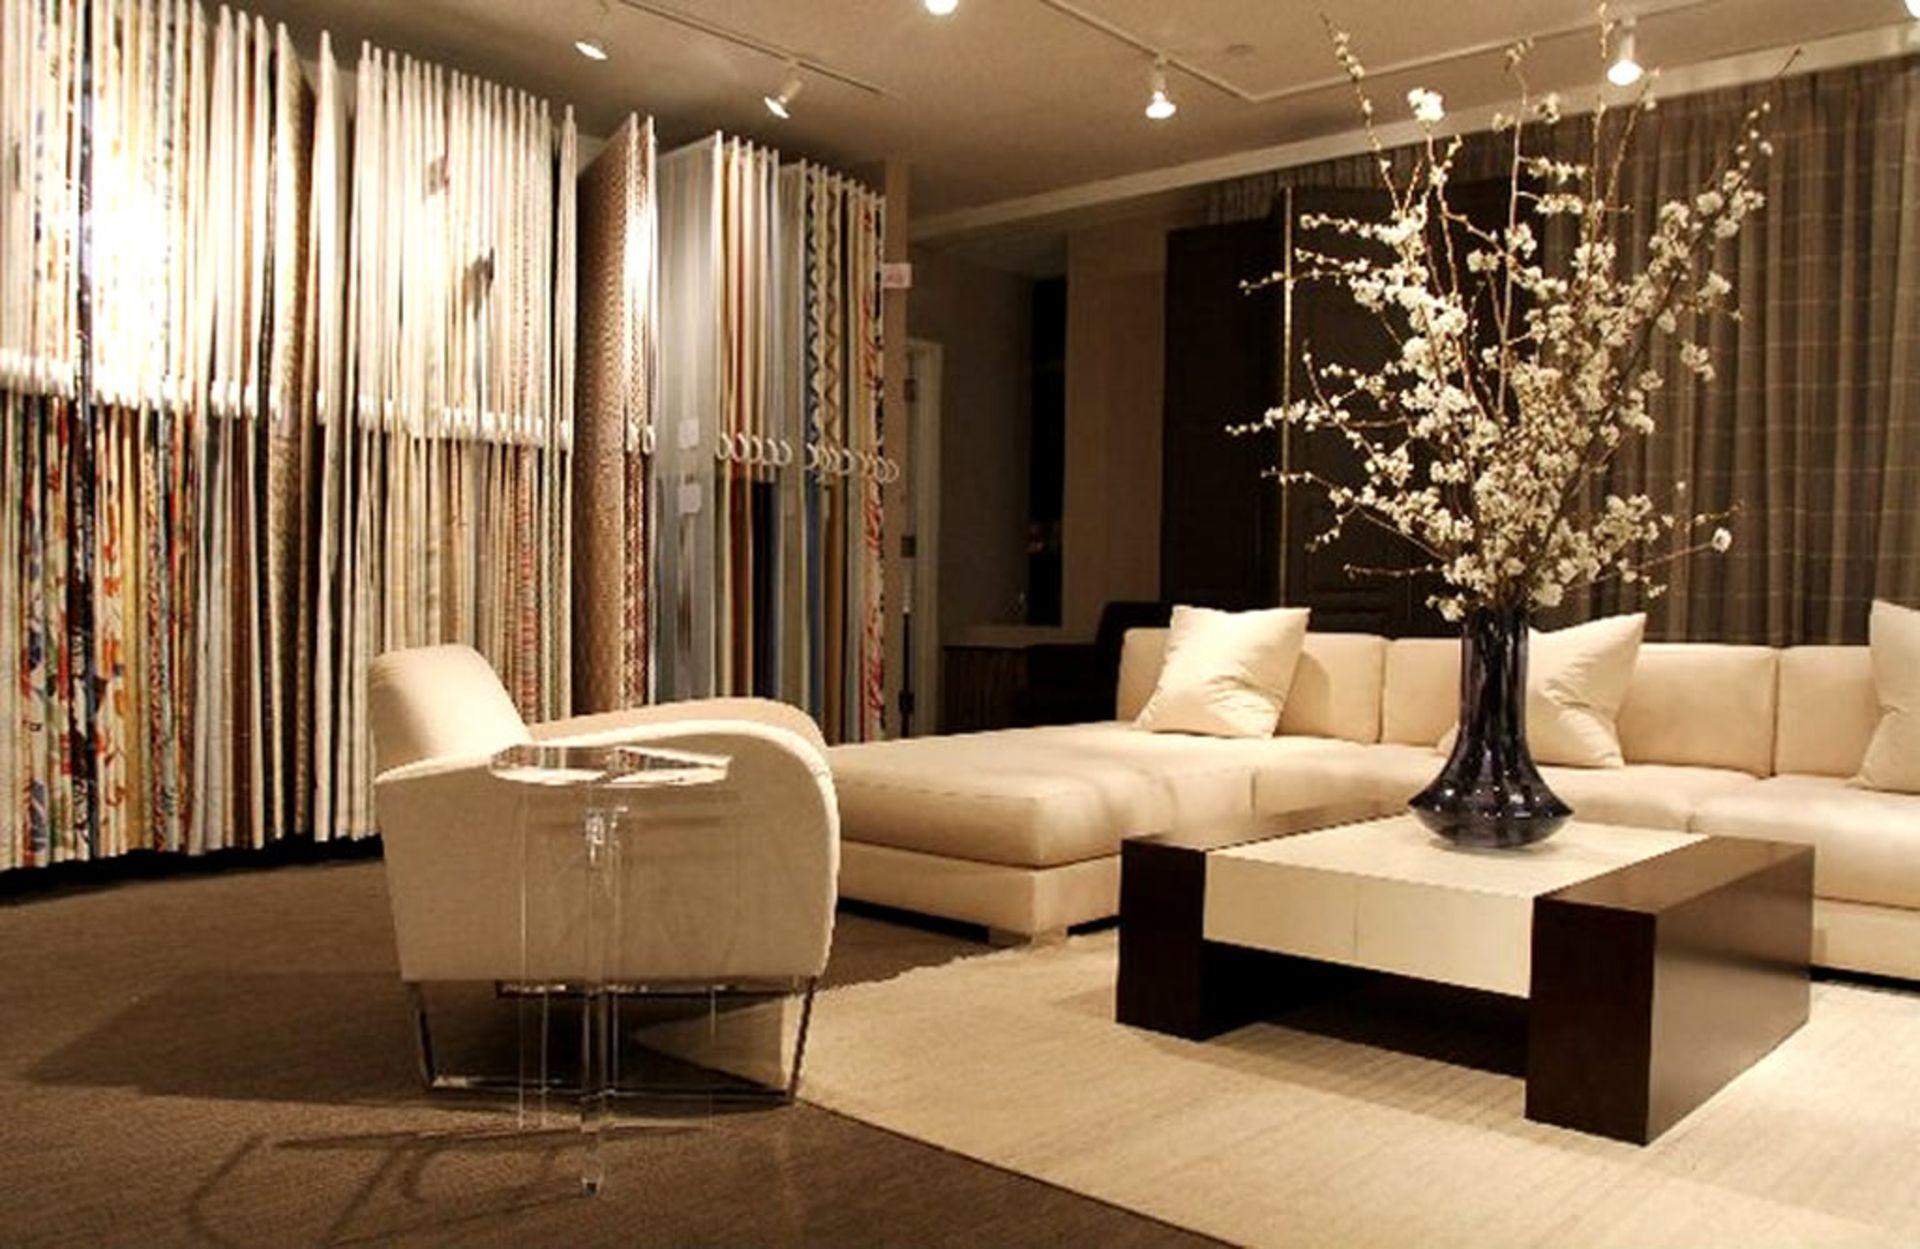 Interior Design Services X Luxury Furniture Retail Store